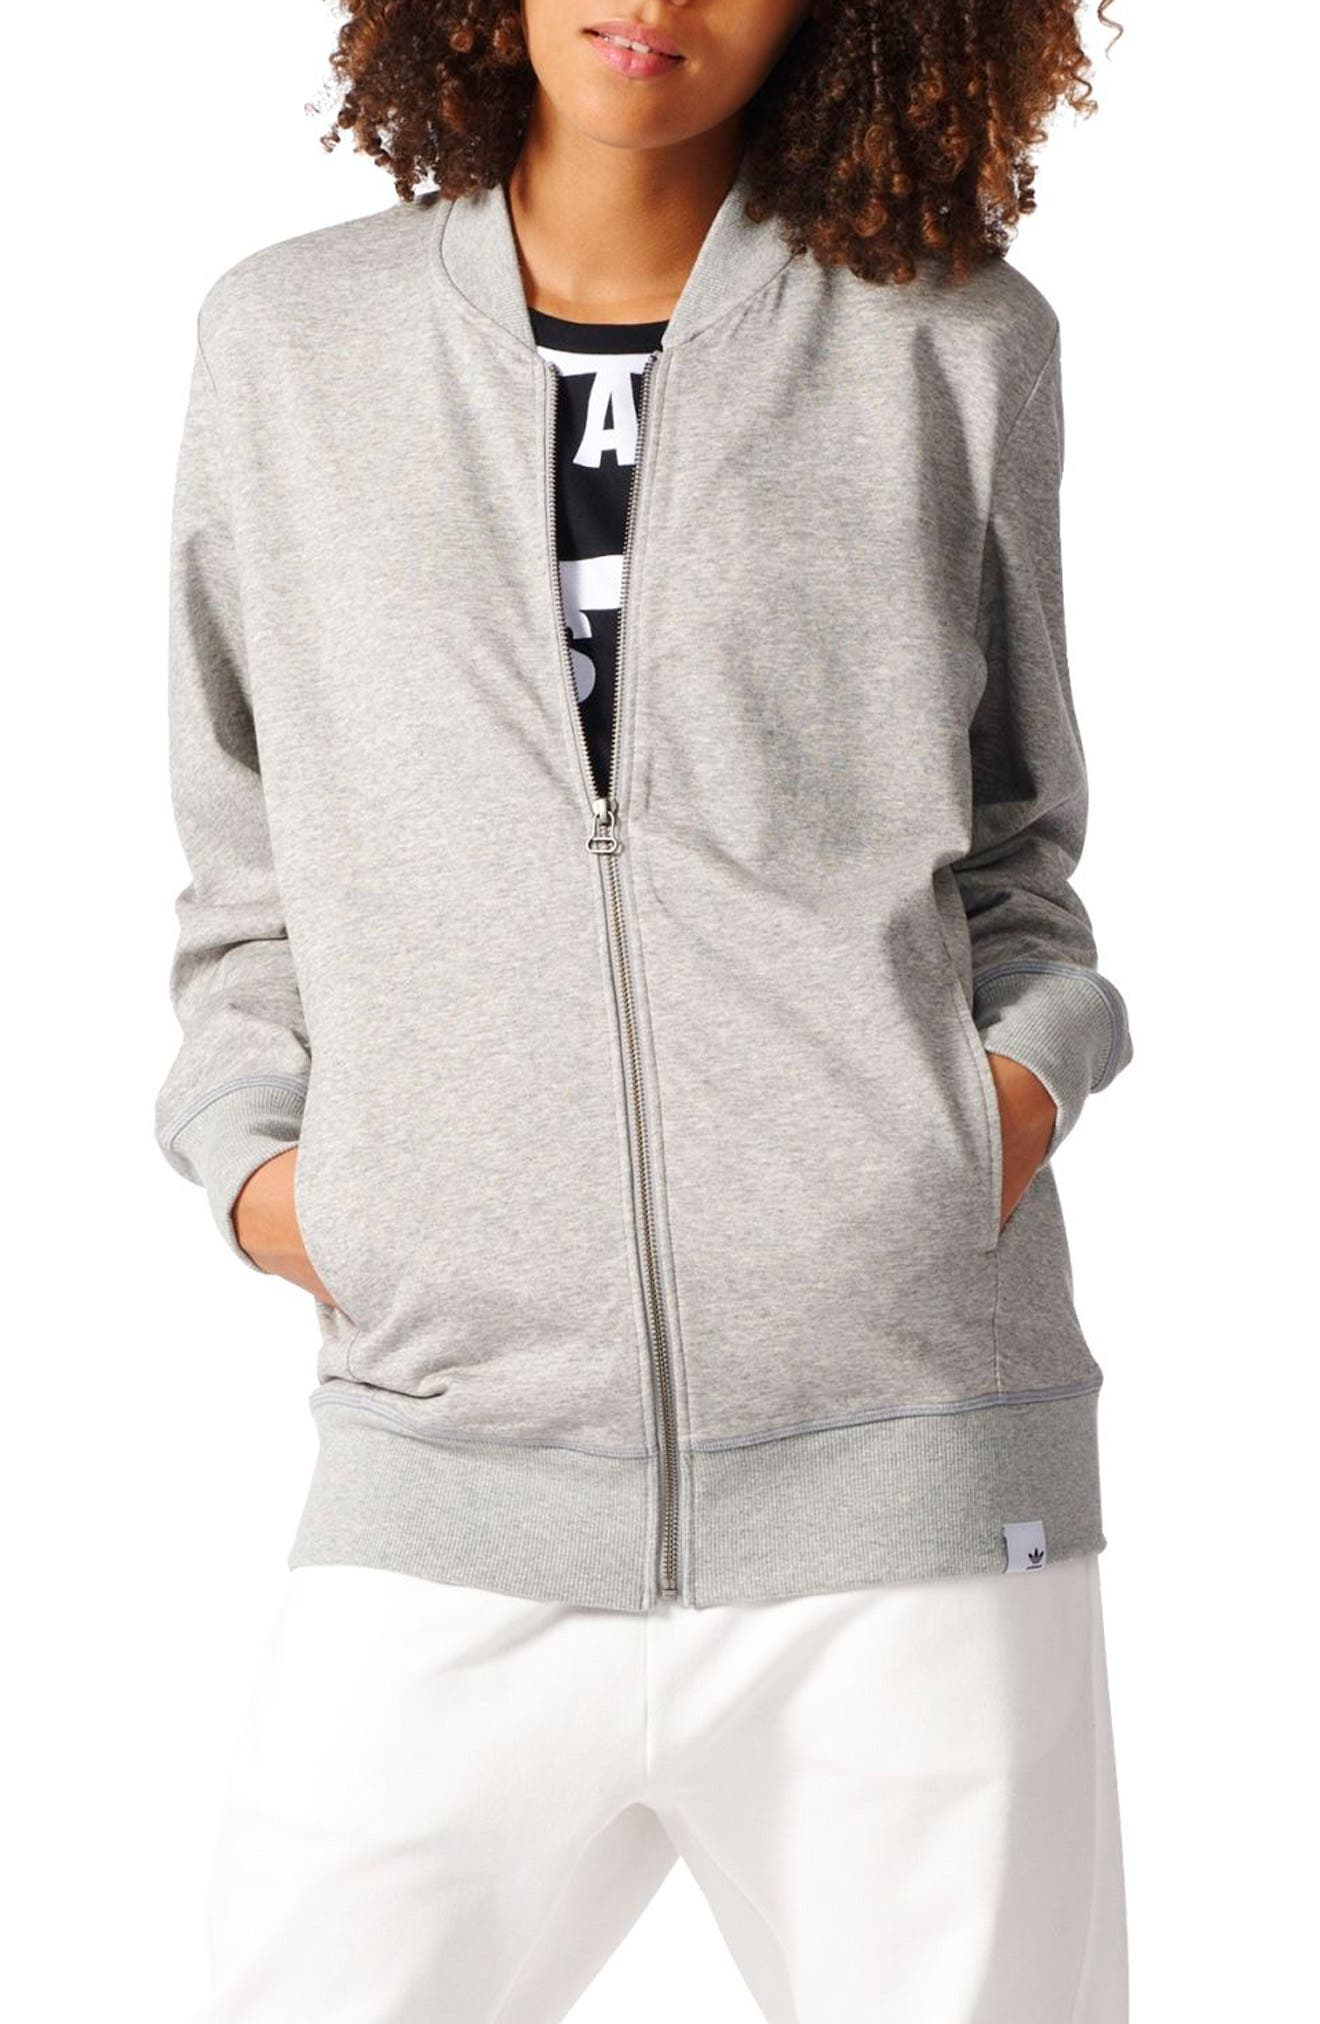 adidas Originals XBYO Knit Jacket